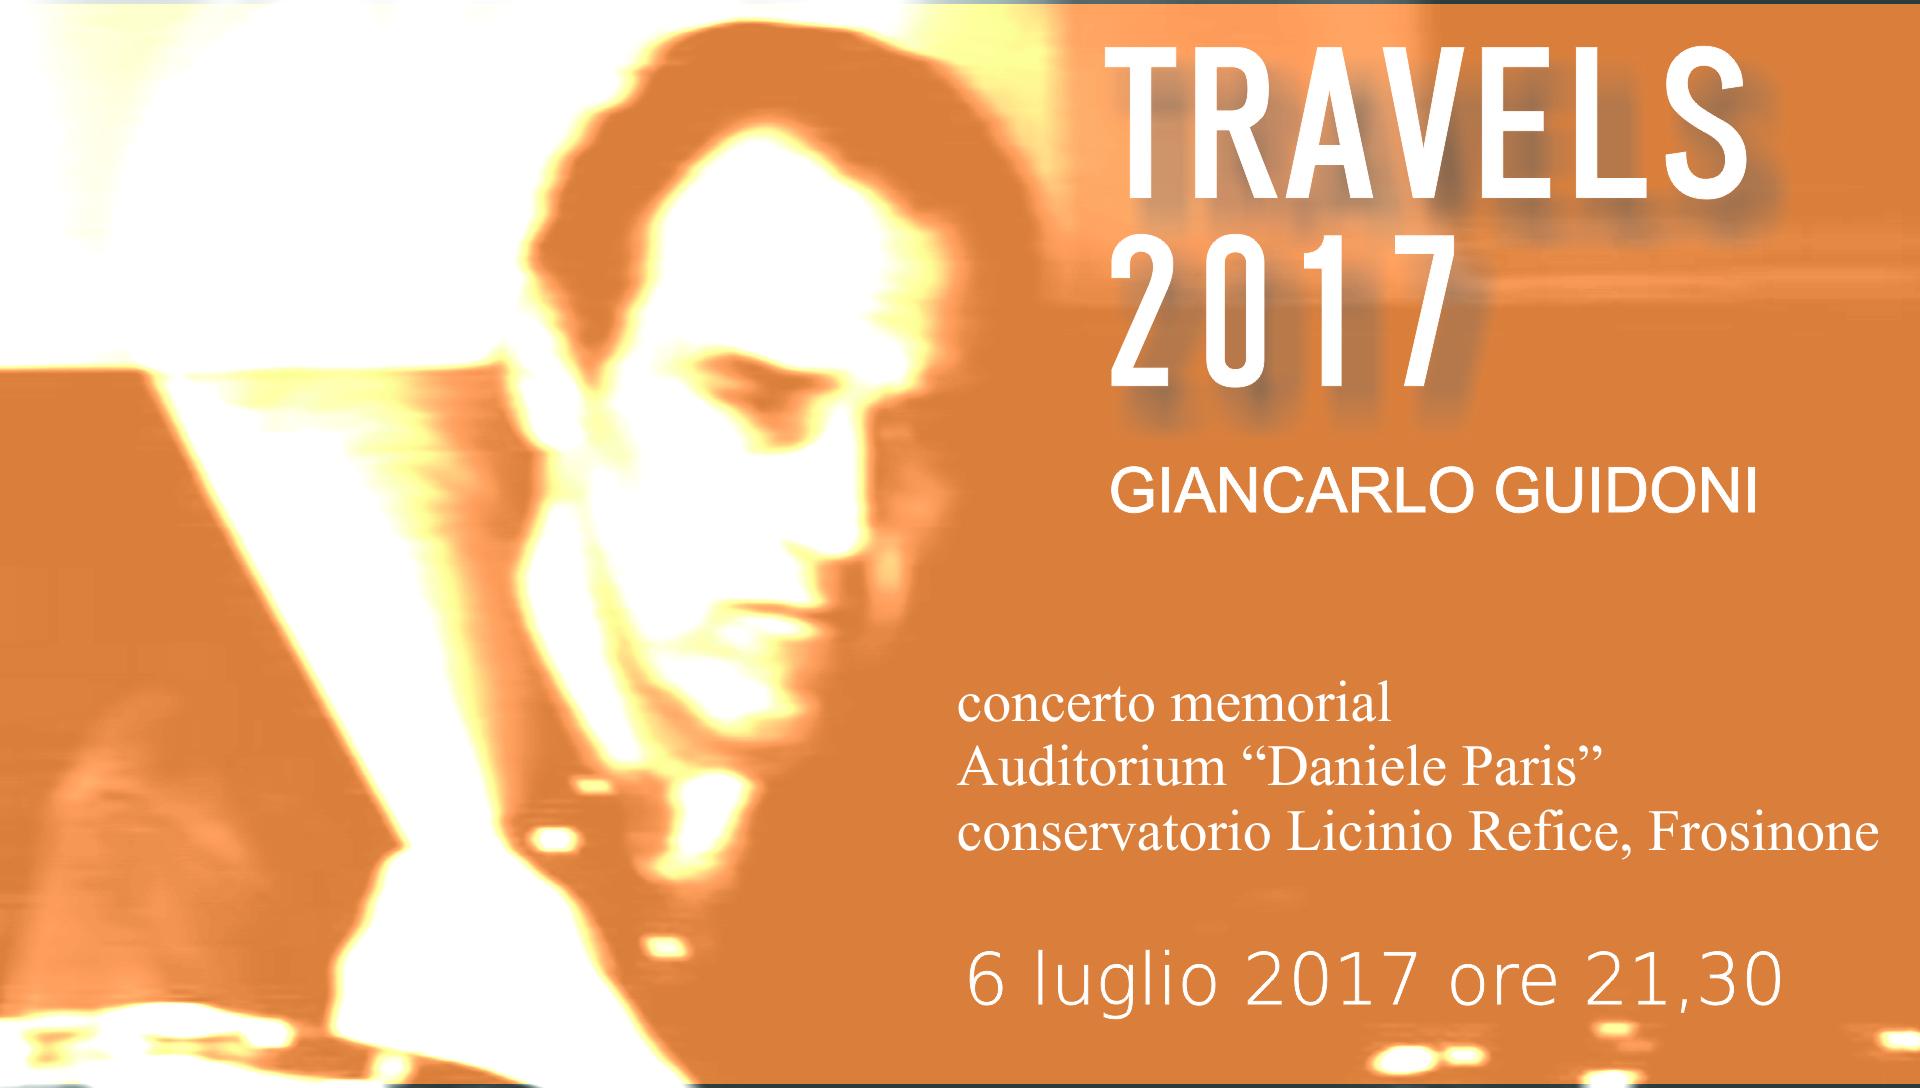 Travels 2017 - Giancarlo Guidoni Memorial